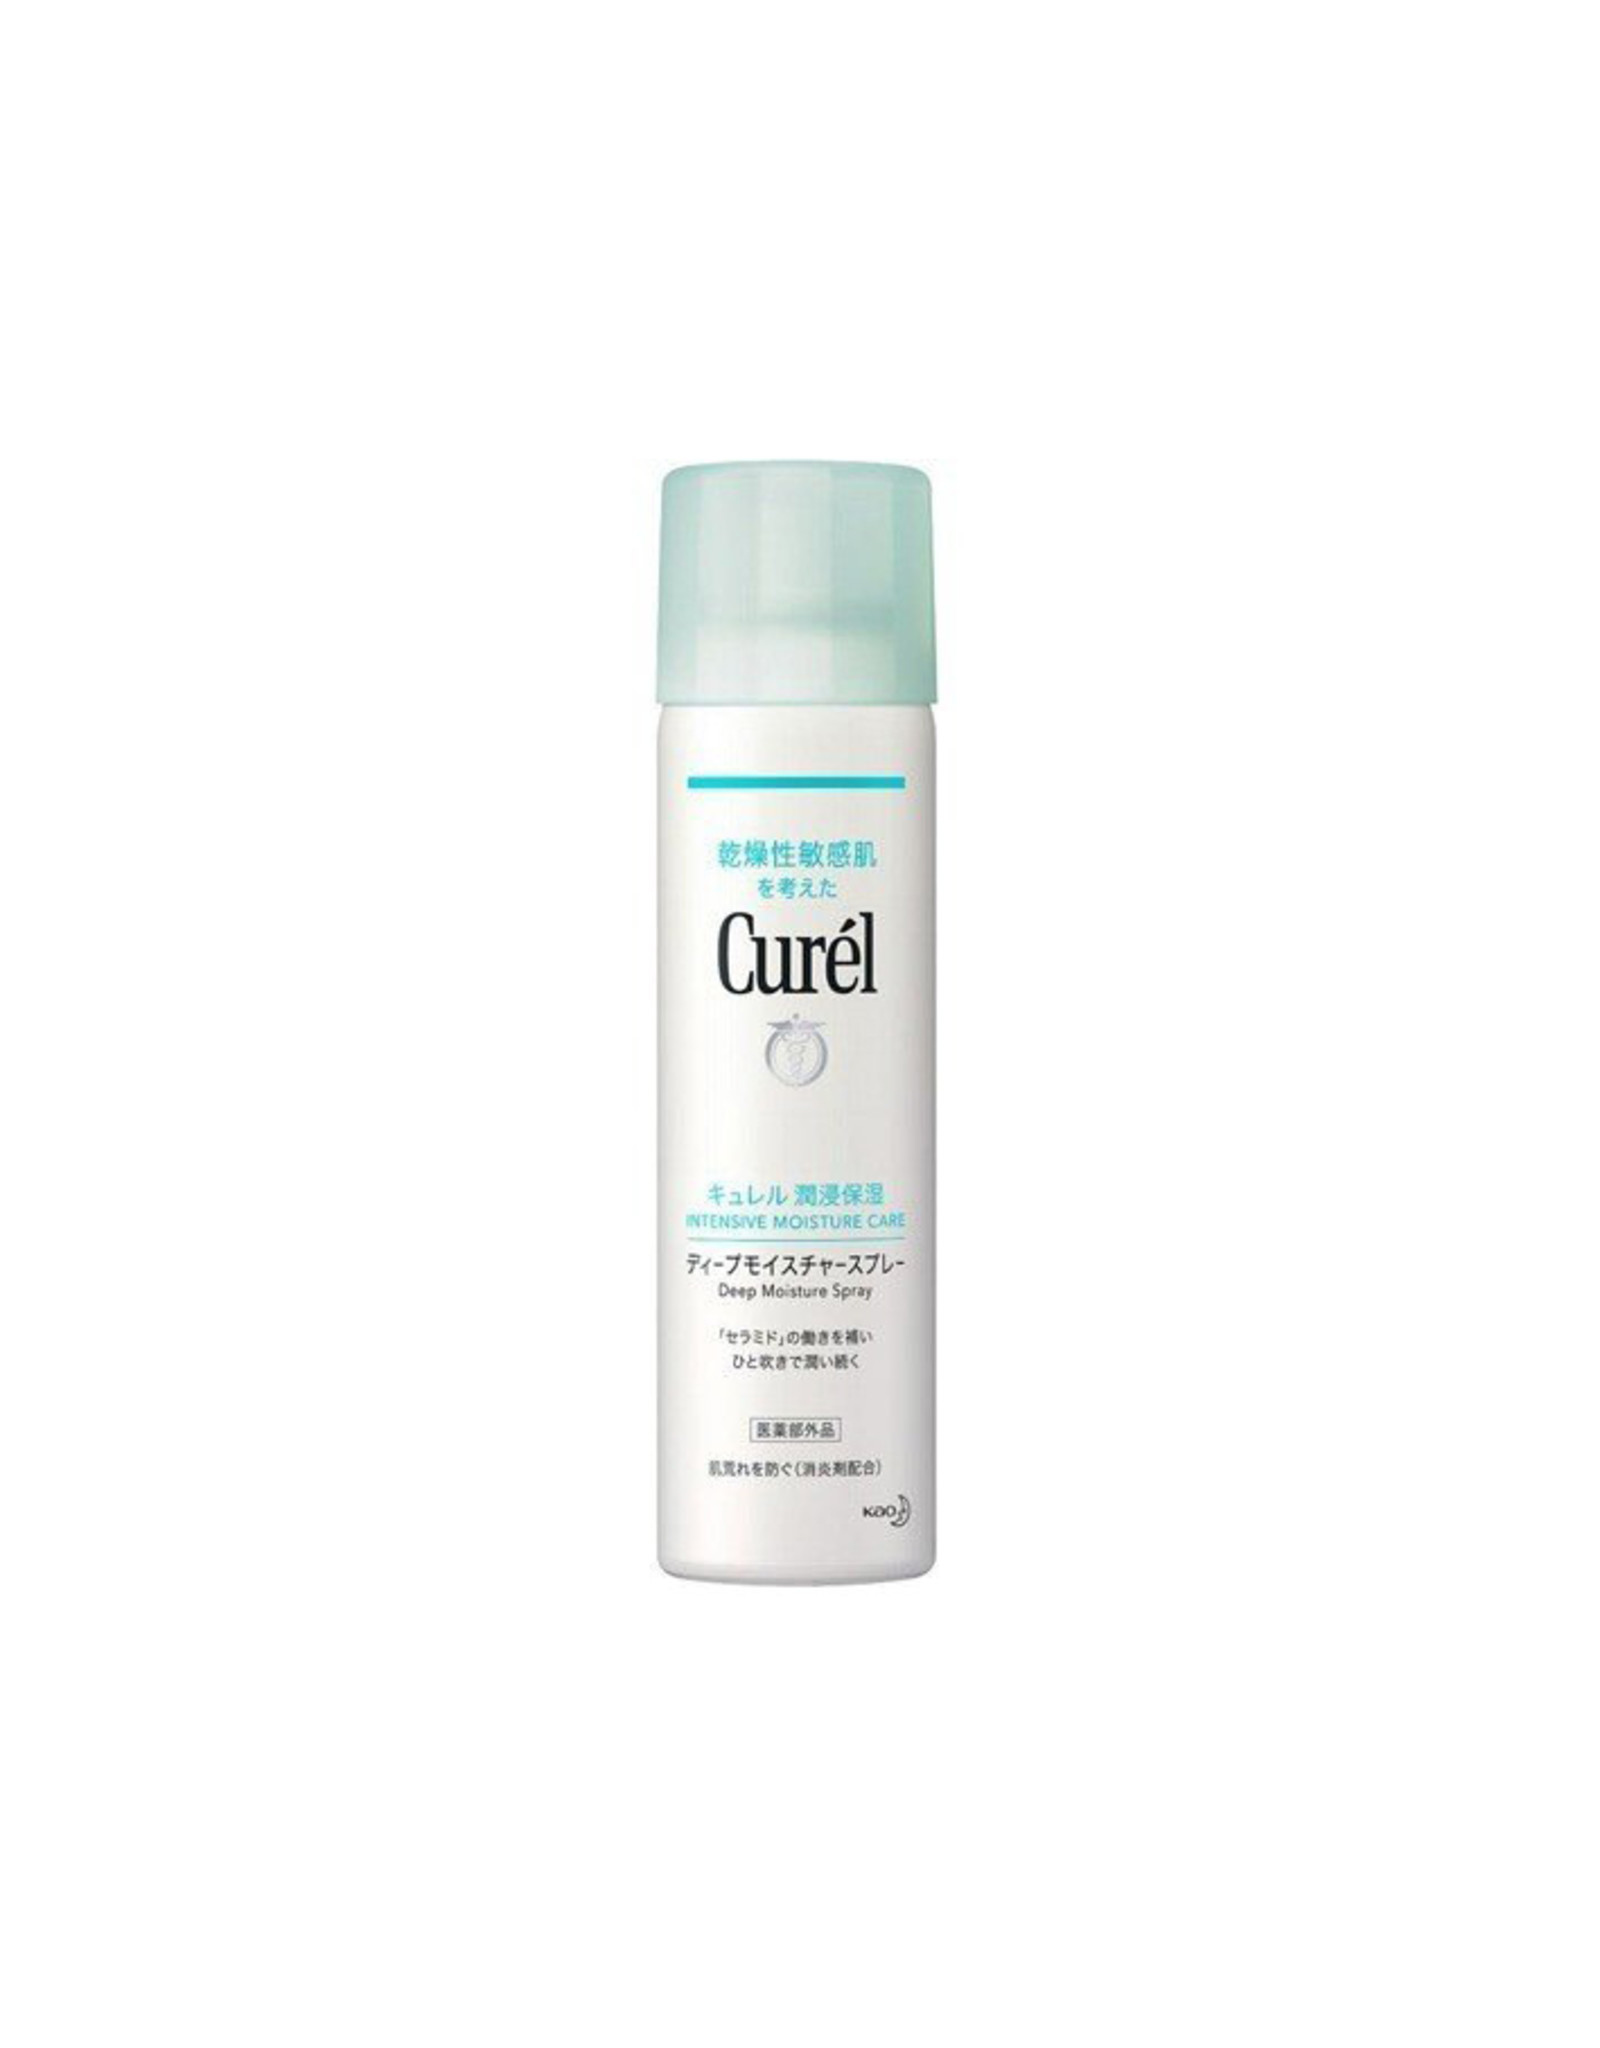 Kao Kao Curél Intensive Moisturizing Spray 150g